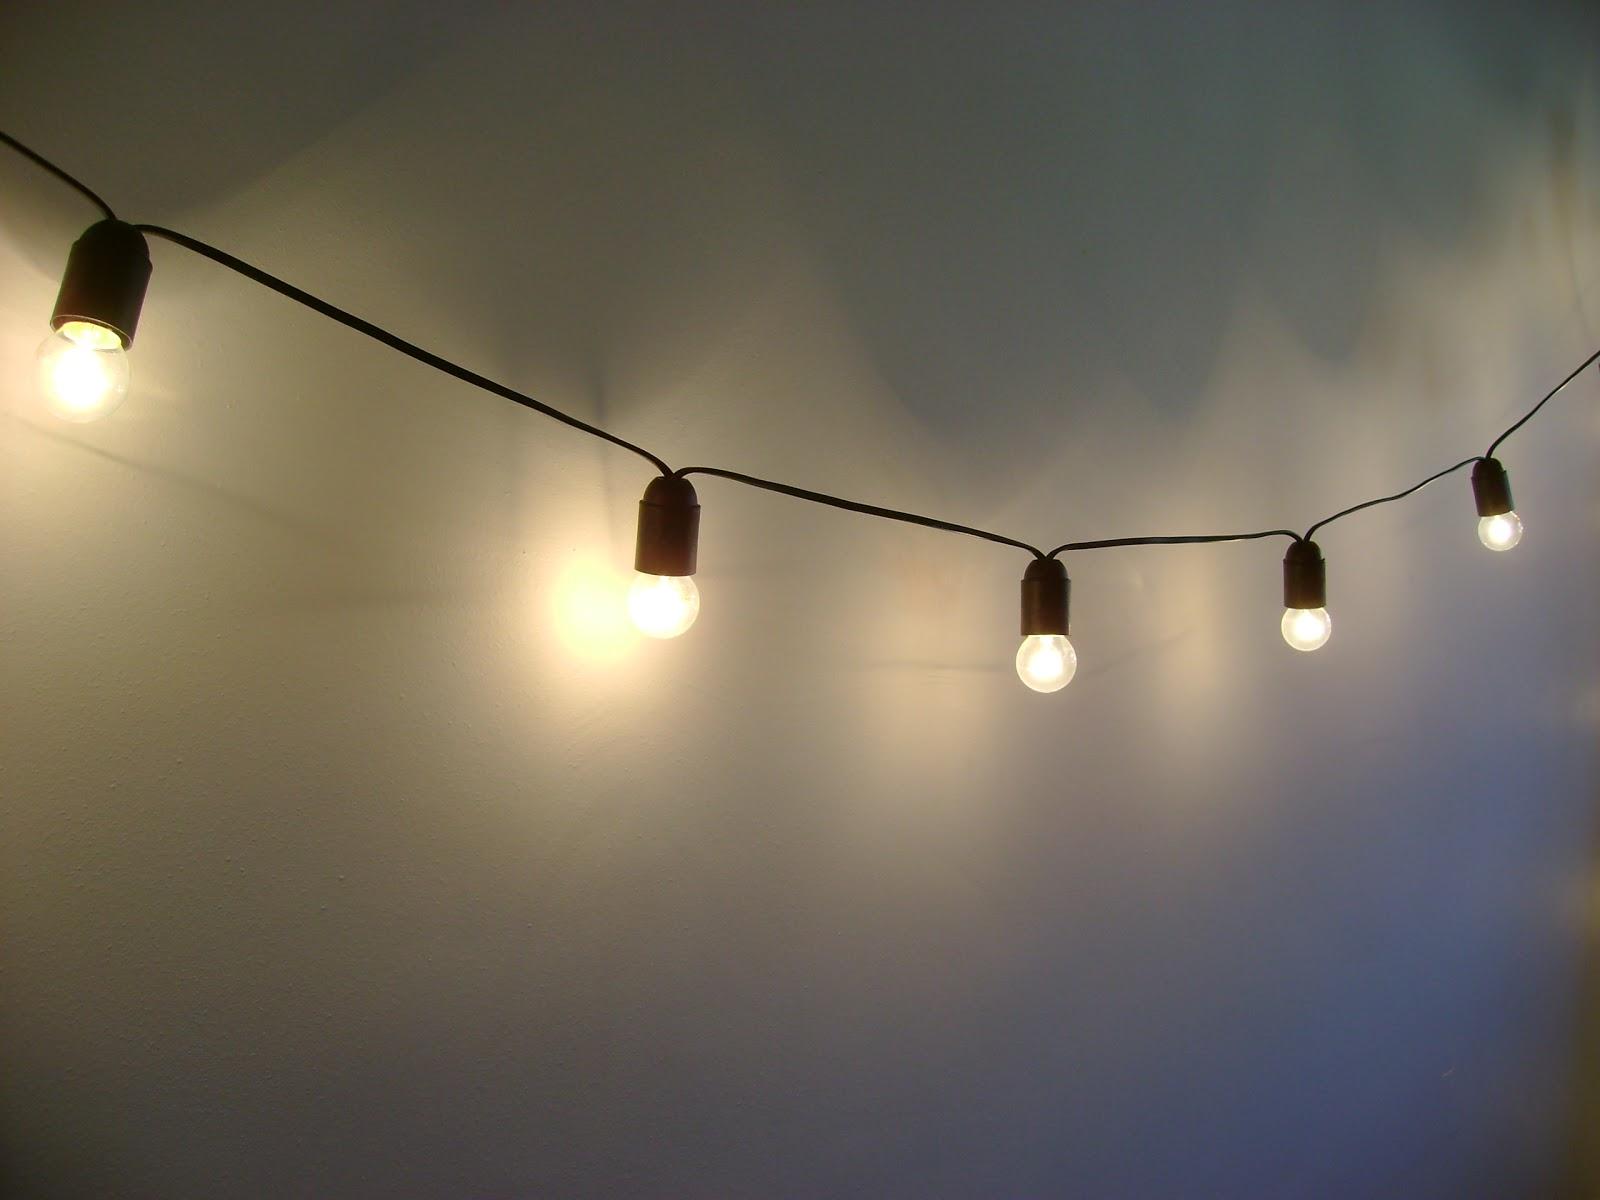 El taller de chlo diy guirnalda de luces for Guirnaldas de luces para exterior